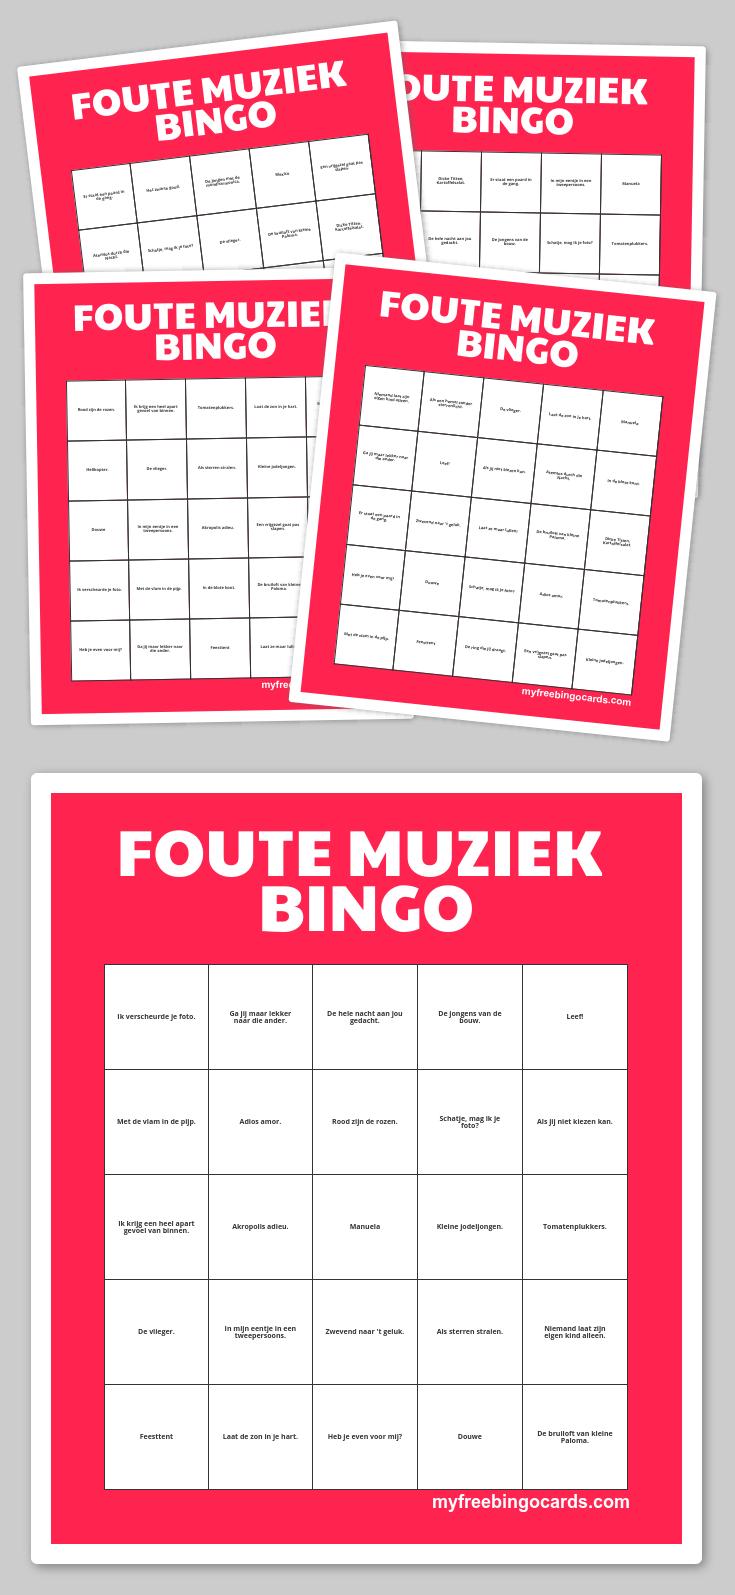 Foute Muziek Bingo | Kinderdienst, Muziek